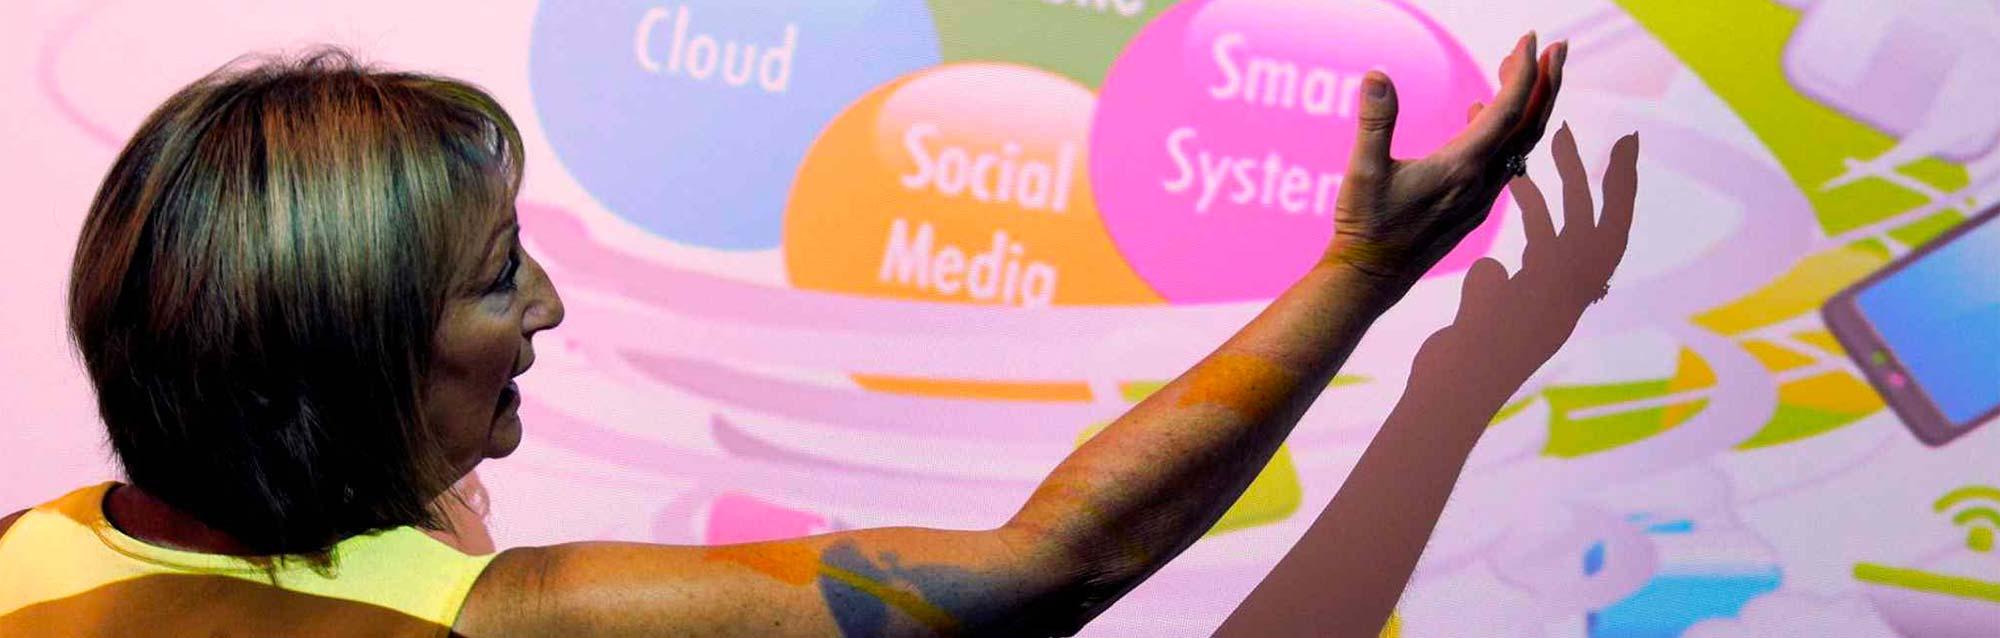 Public Relations and Digital Communications